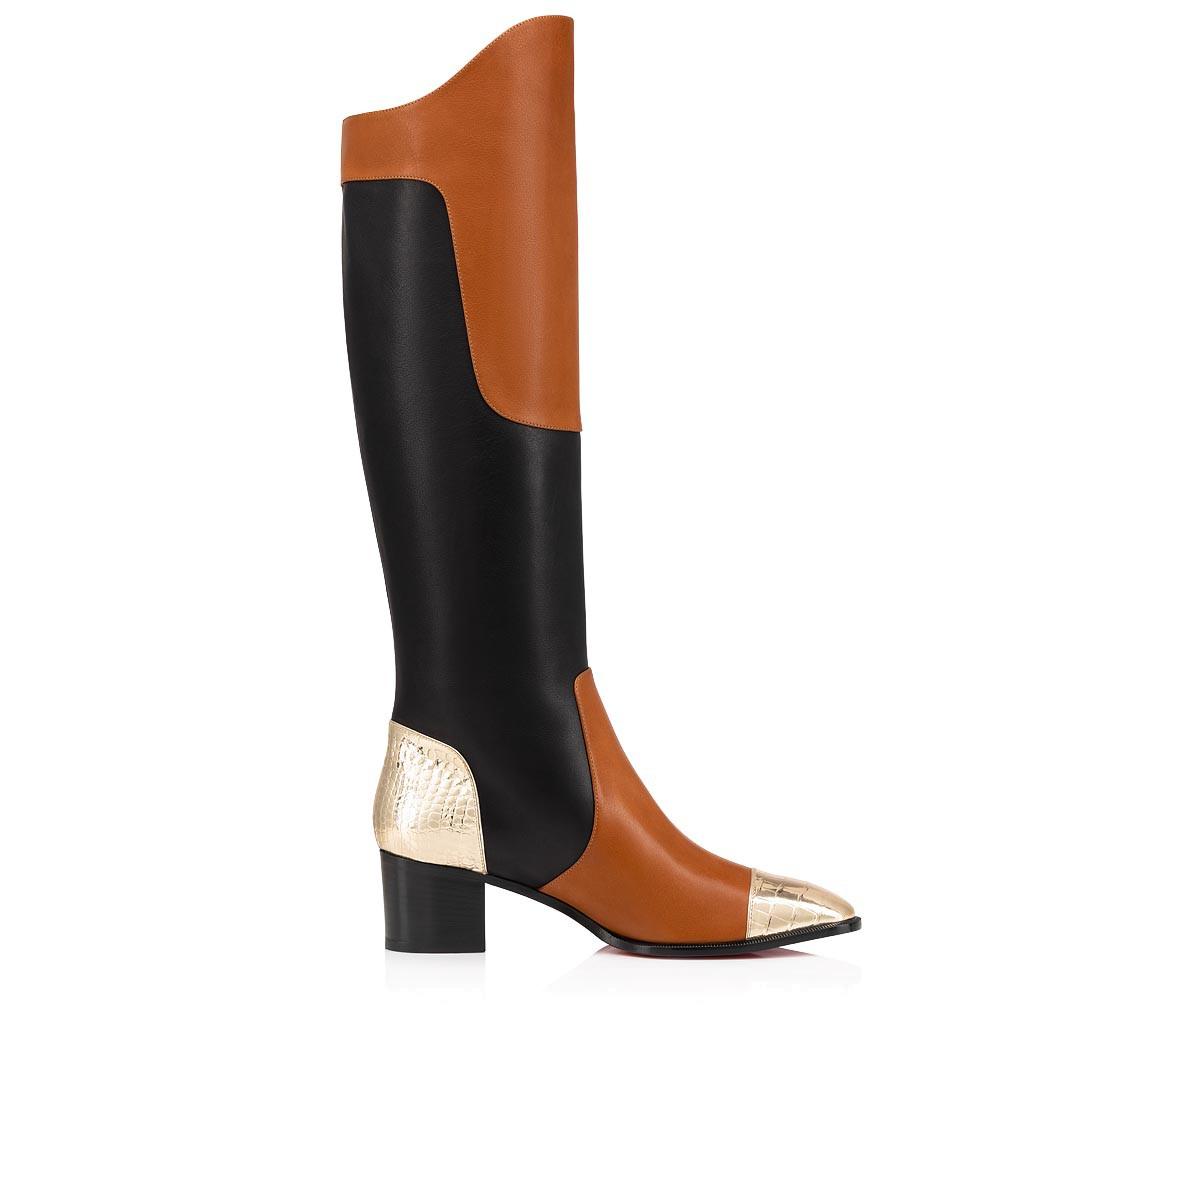 Shoes - Mosaica - Christian Louboutin